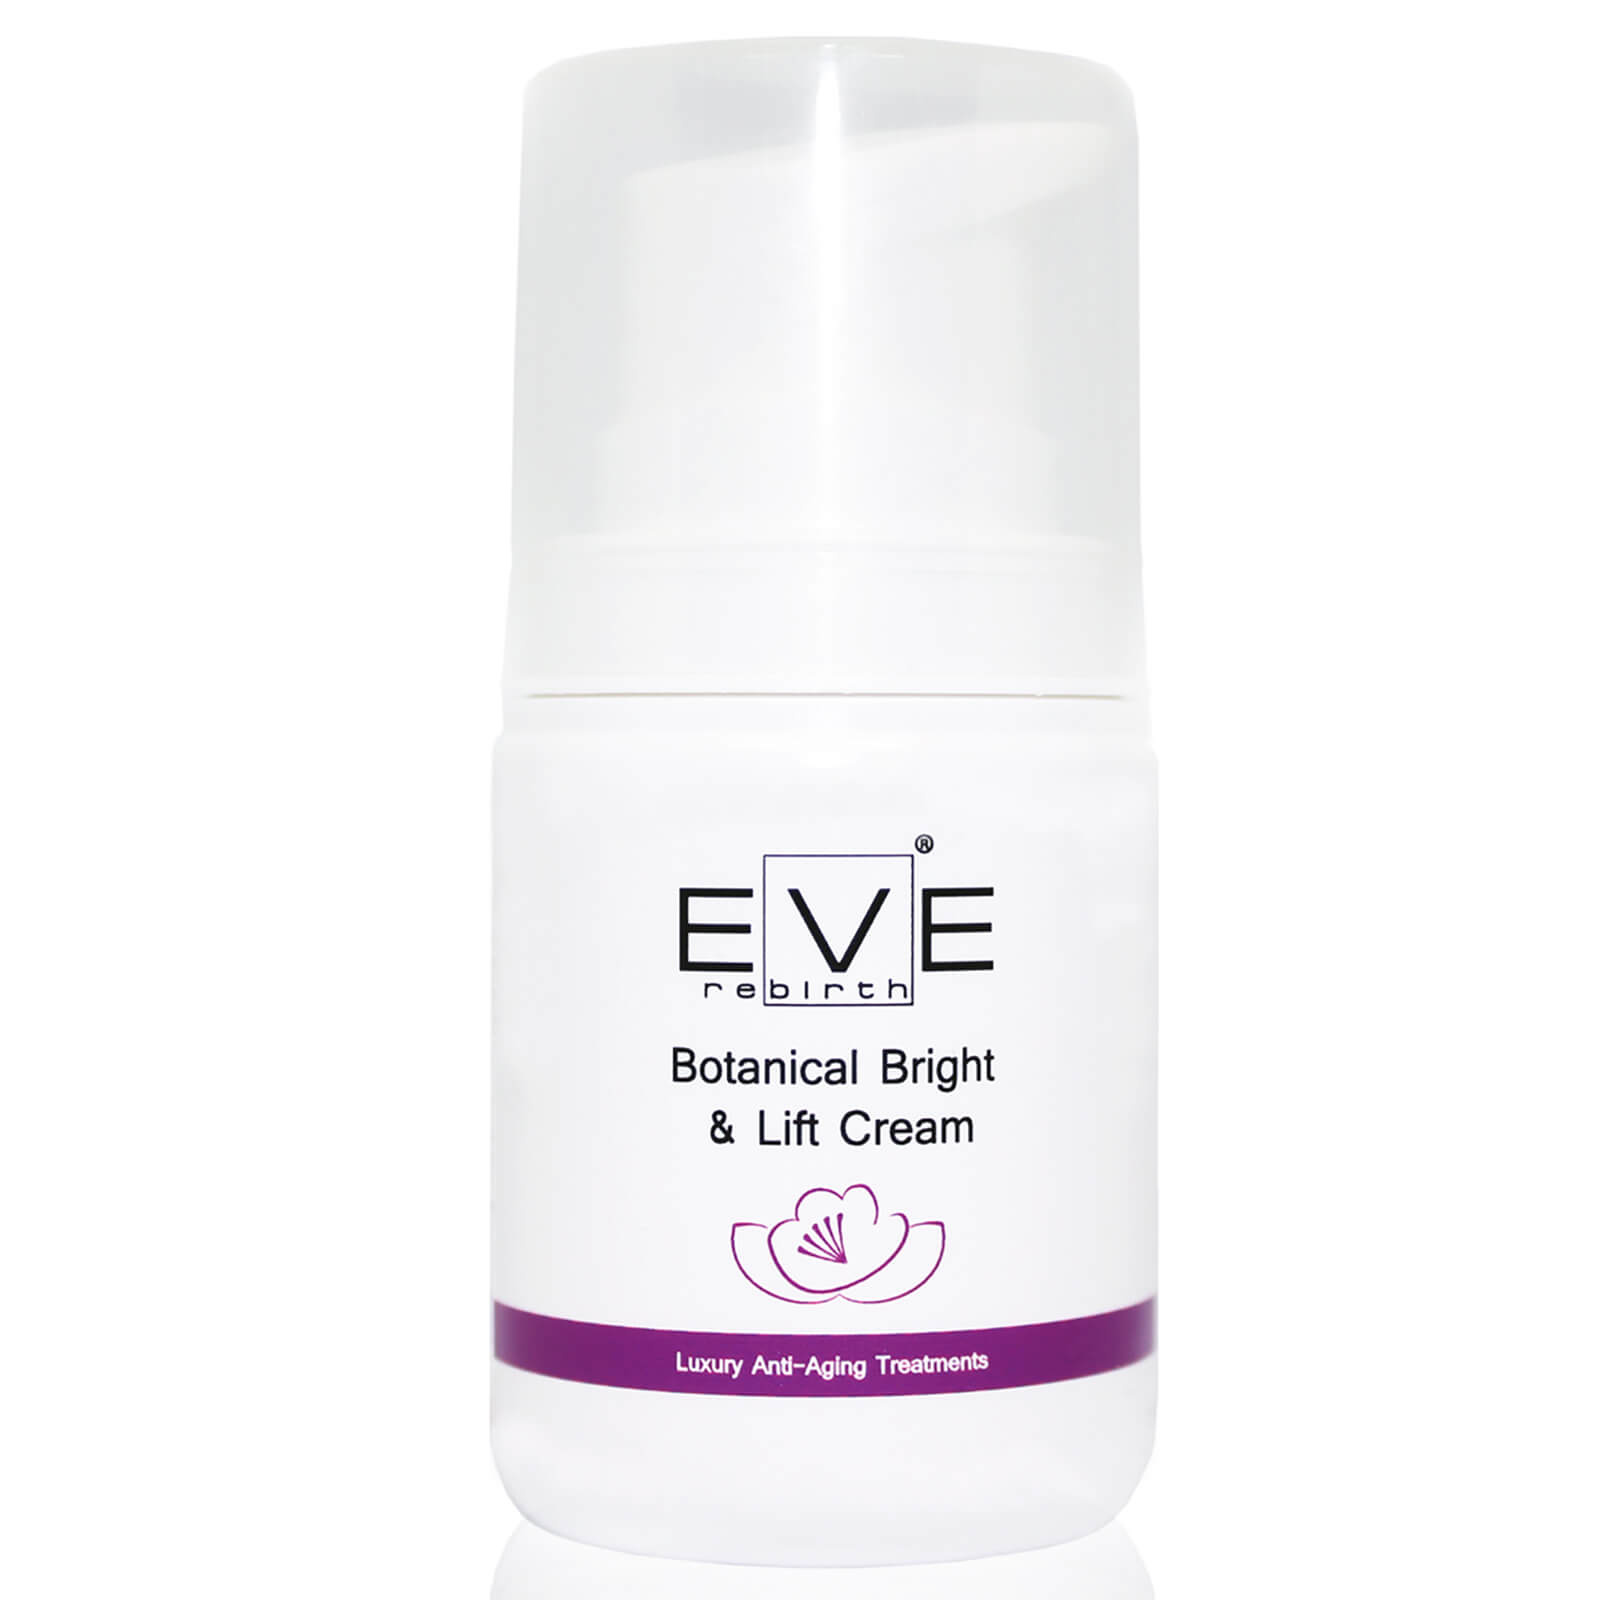 Eve Rebirth Botanical Bright Lift Cream Beautyexpert Sleep Buddy Set Bed Cover Square Cotton Sateen Extra Product Description